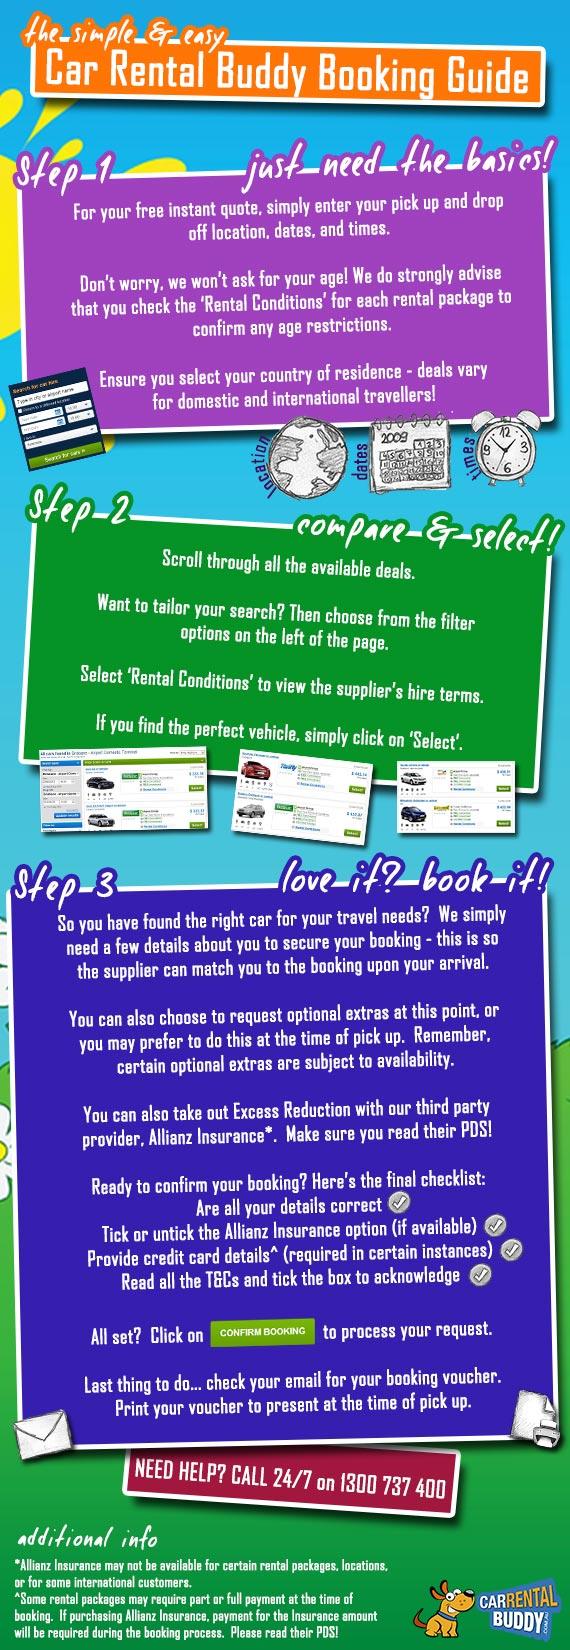 Car Rental Buddy Booking Guide